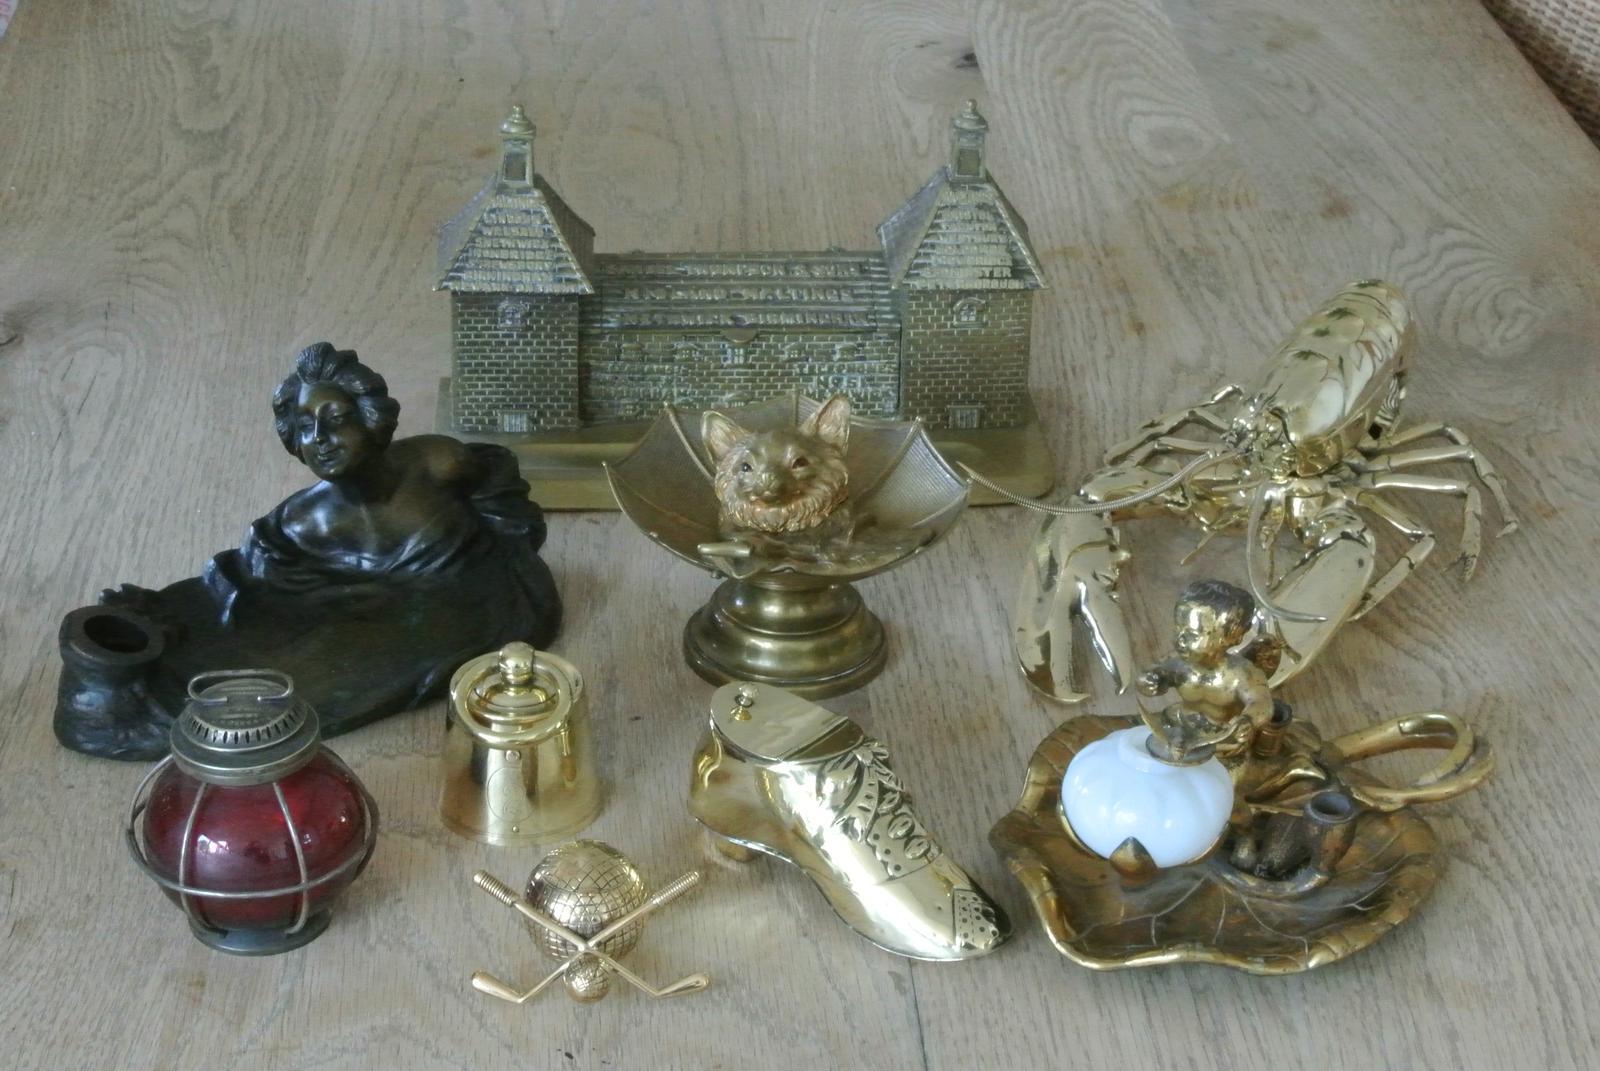 Indigojollyphant Antiques image (5 of 5)